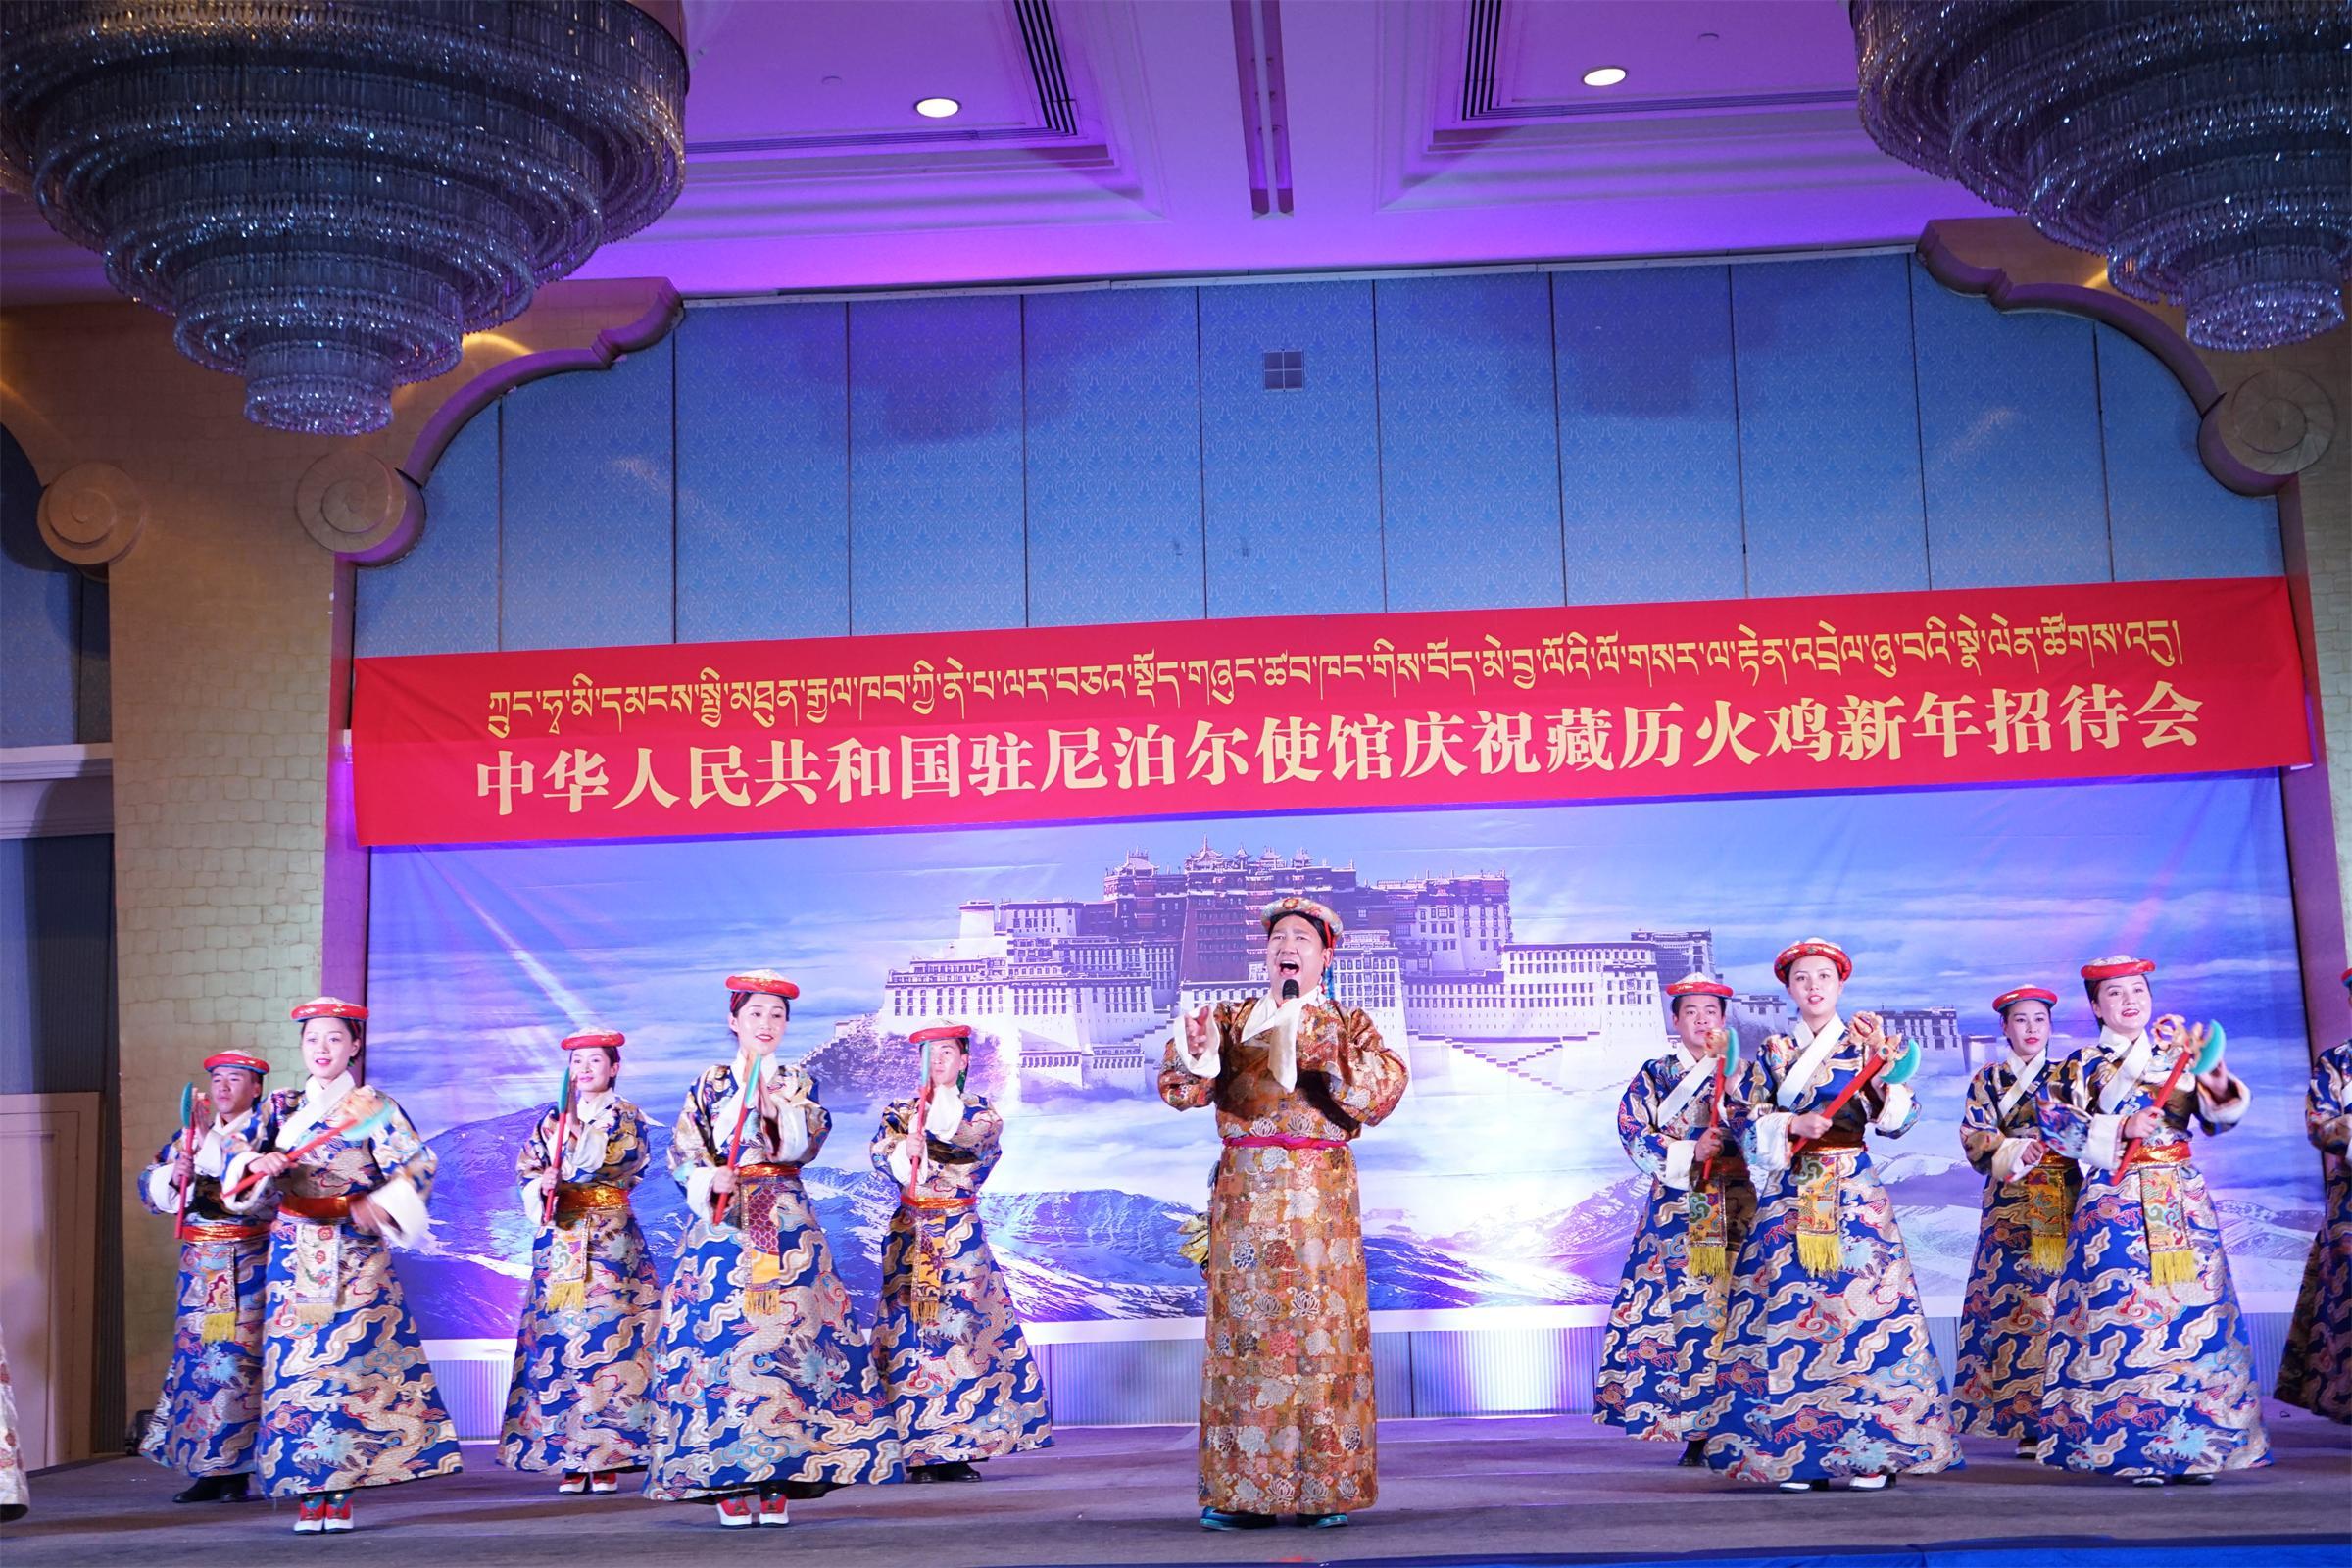 Chinese Tibetan New Year marked in Kathmandu